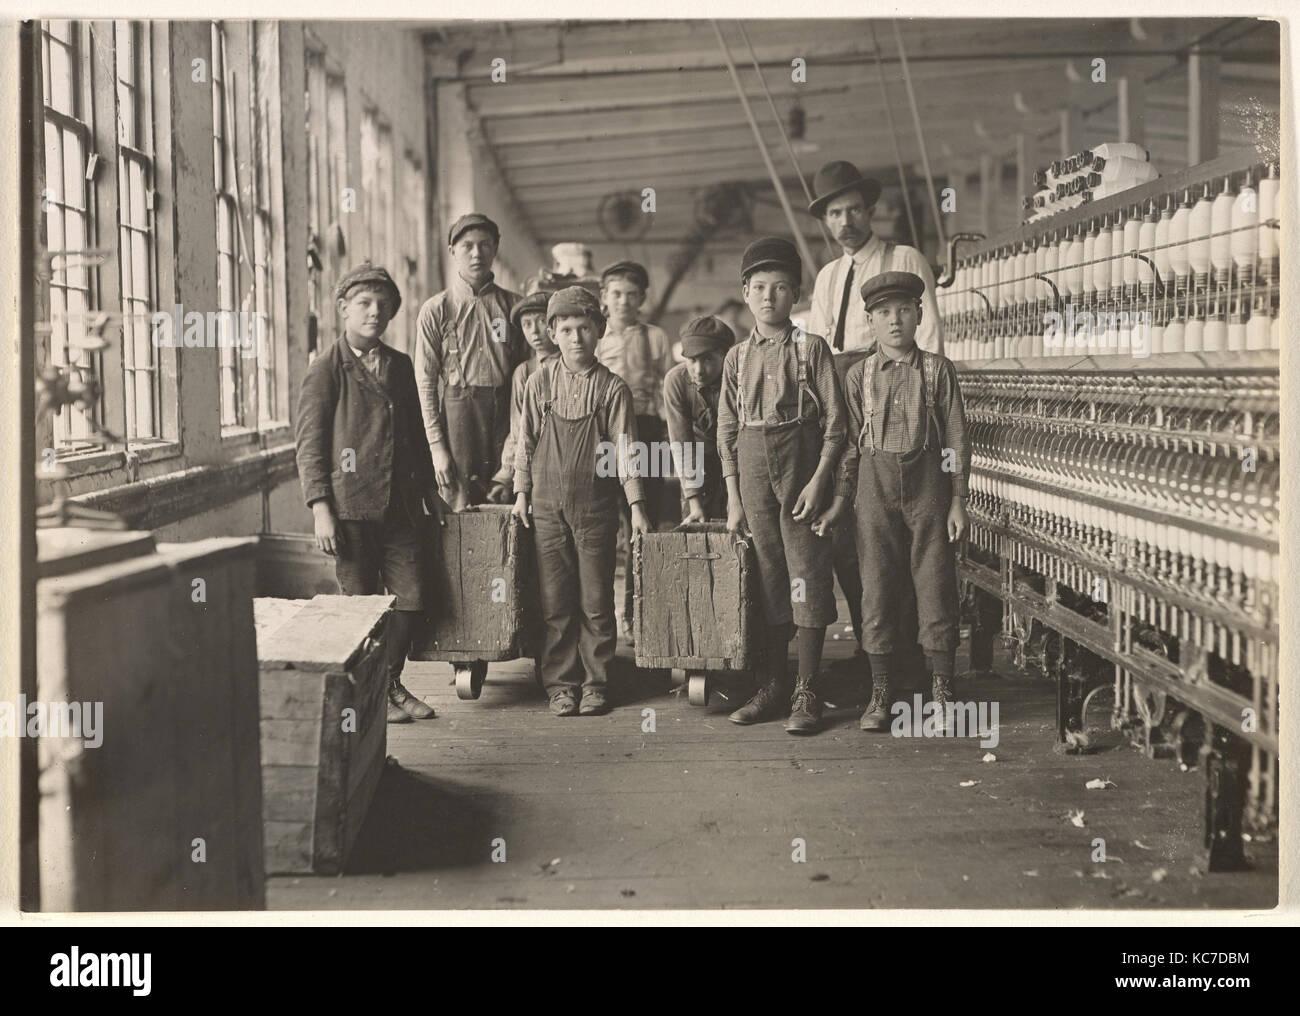 Mill Children #440, South Carolina, Lewis Hine, 1908 - Stock Image